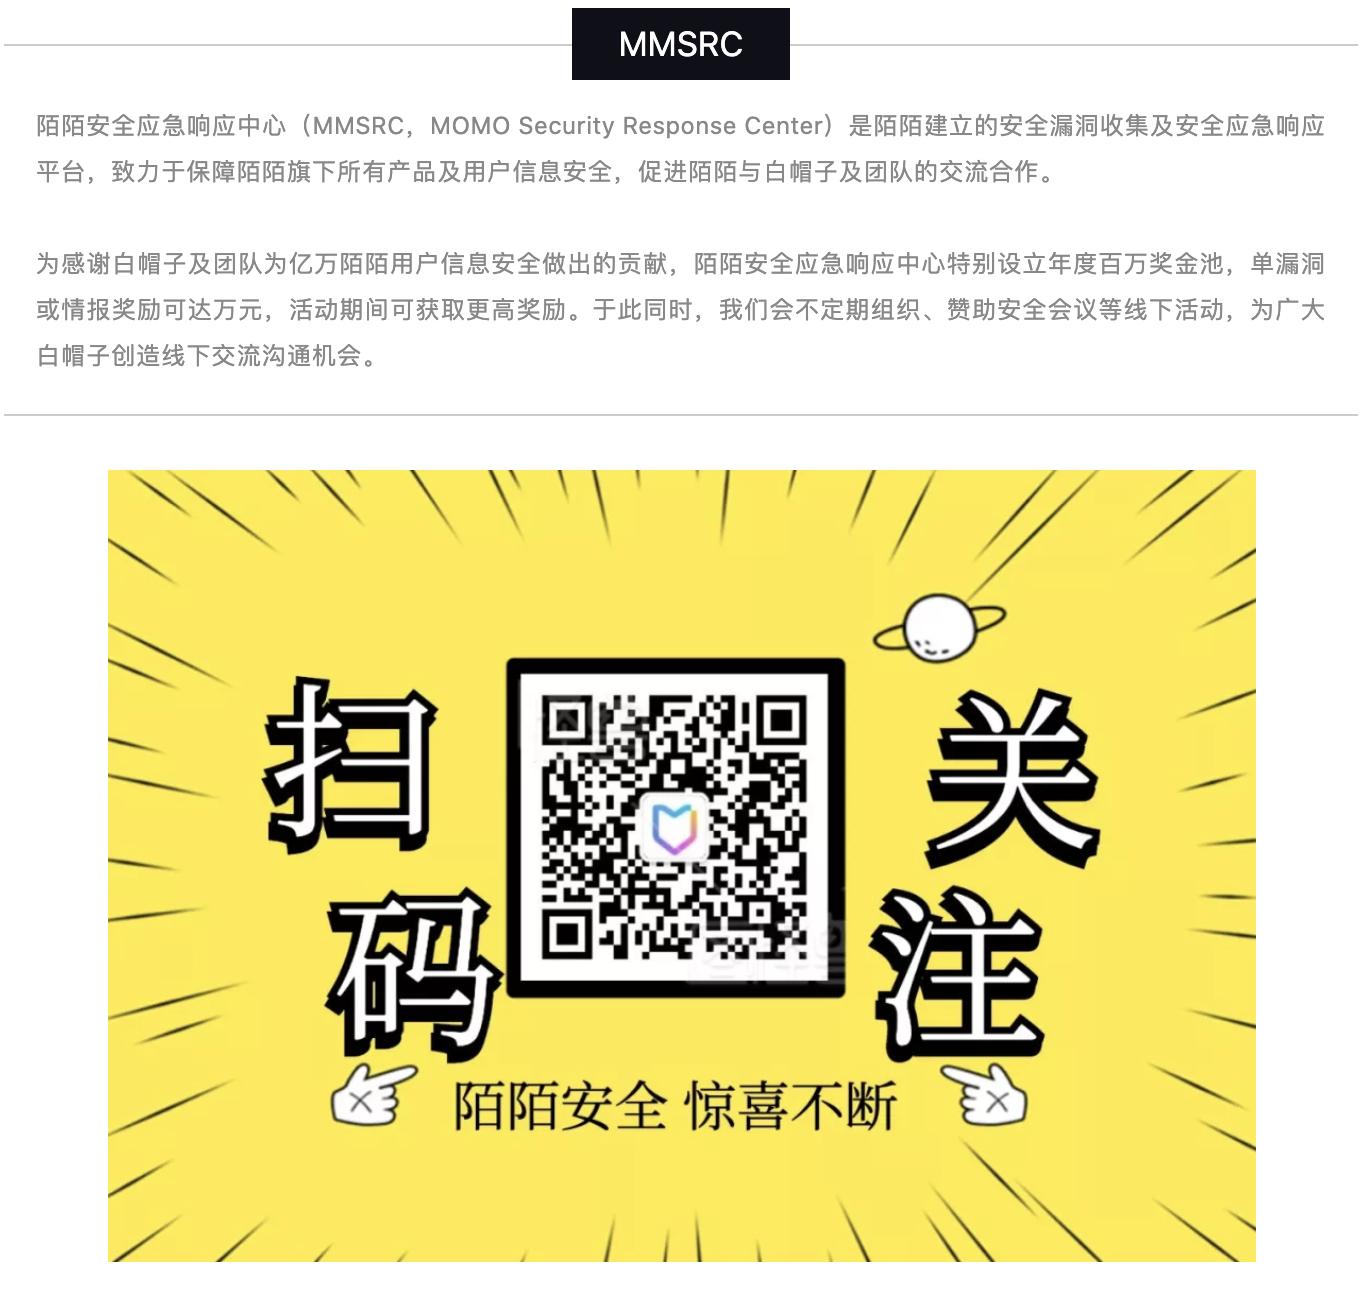 https://momo-mmsrc.oss-cn-hangzhou.aliyuncs.com/img-04dd2b72-e6e2-3ee3-933d-ee30ea7caf24.png